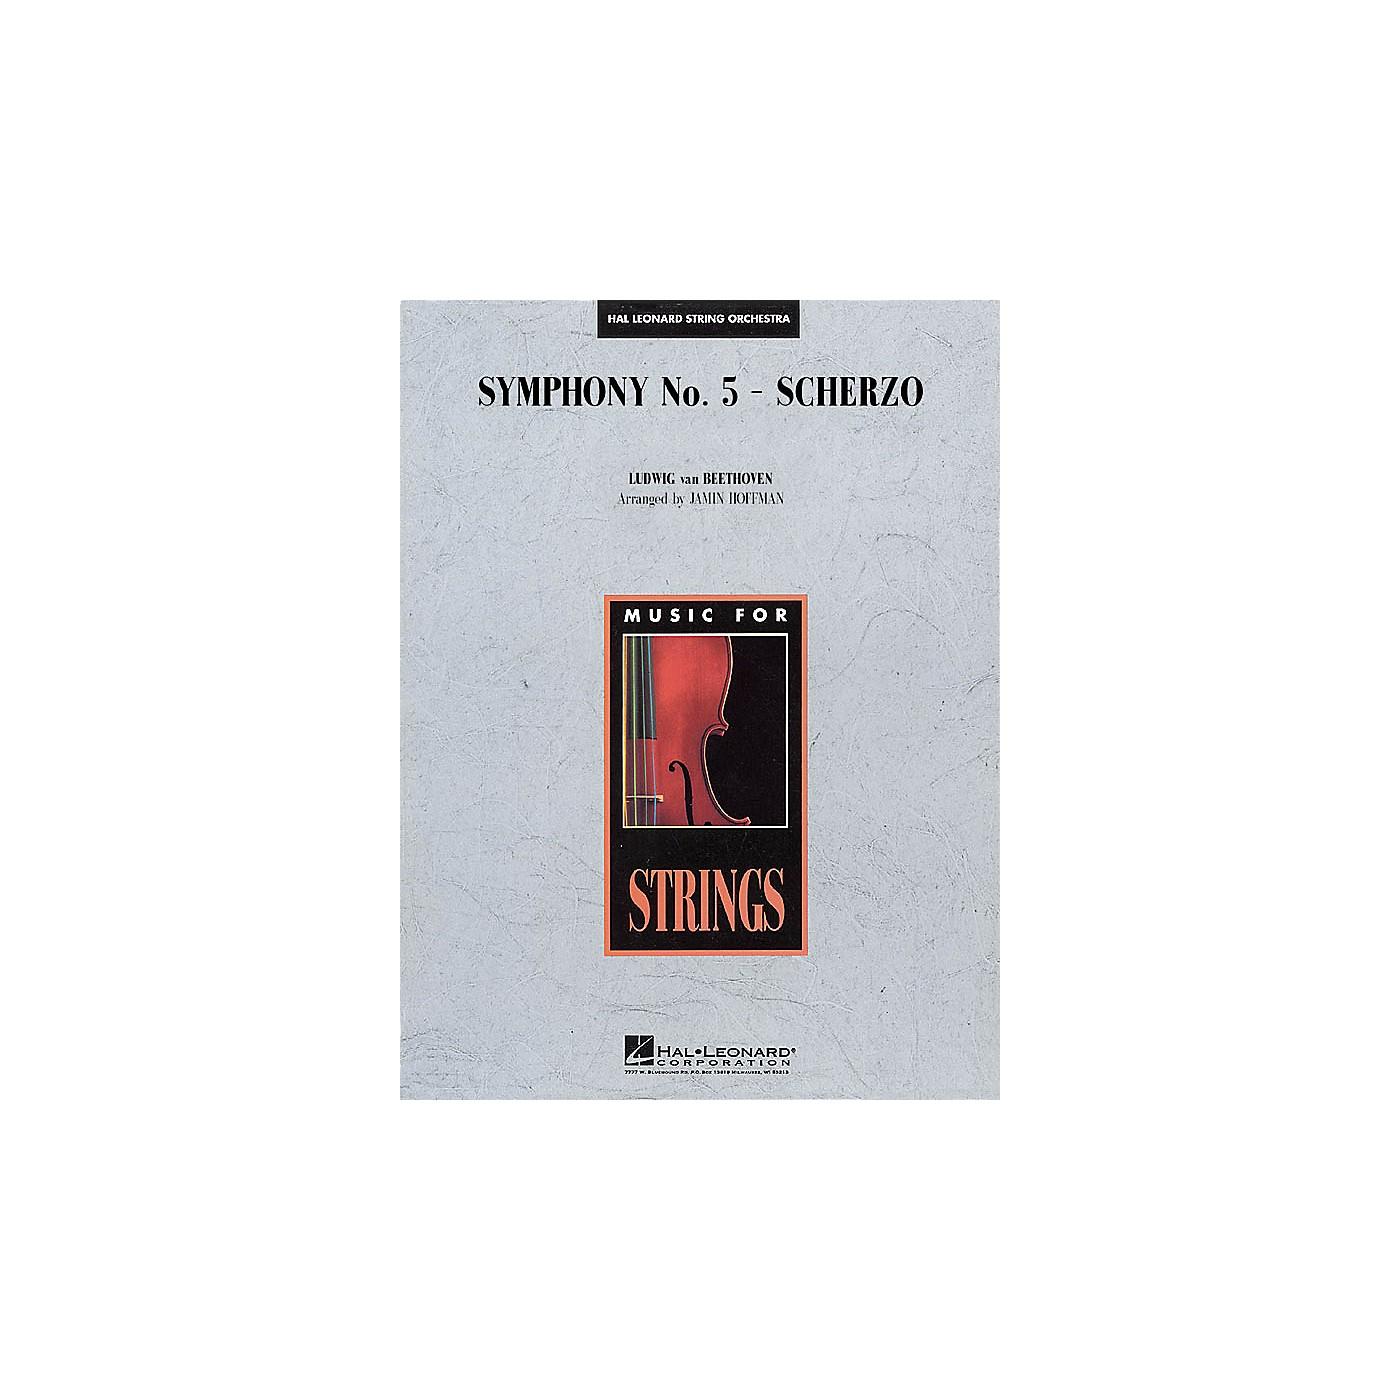 Hal Leonard Symphony No. 5 - Scherzo Music for String Orchestra Series Arranged by Jamin Hoffman thumbnail